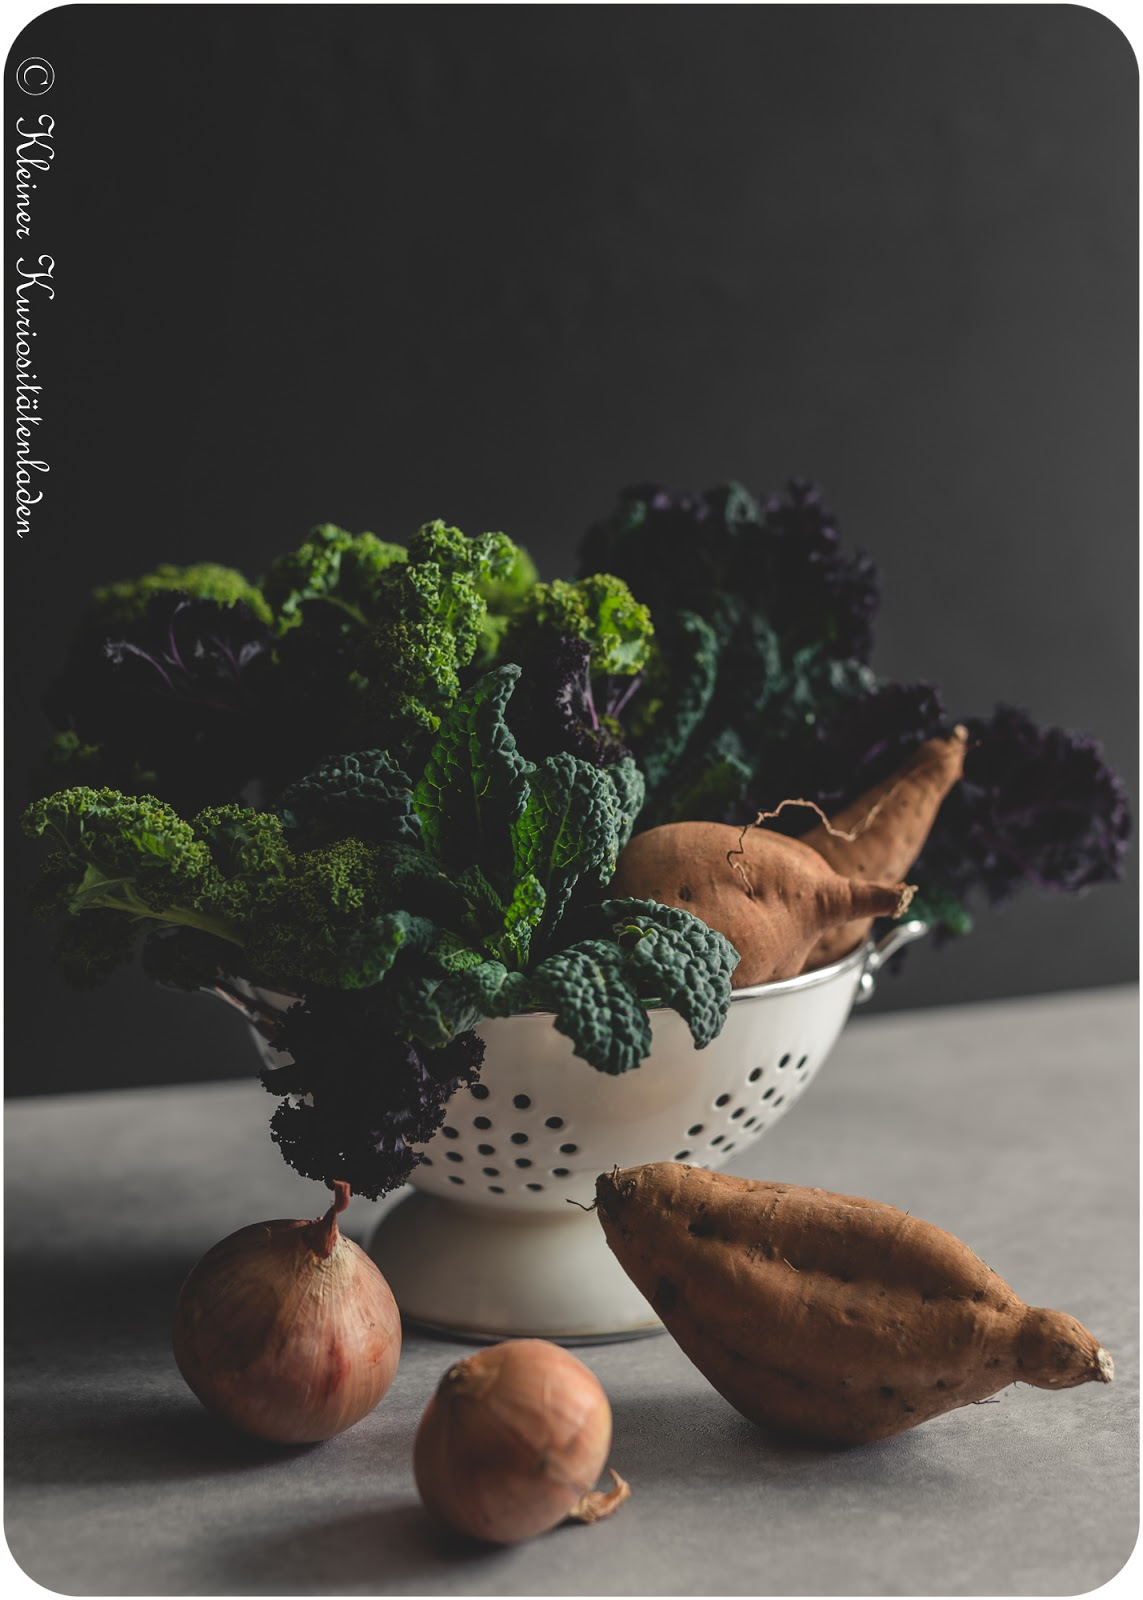 Zutaten Süßkartoffel-Grünkohl-Bratlinge mit Joghurtdip